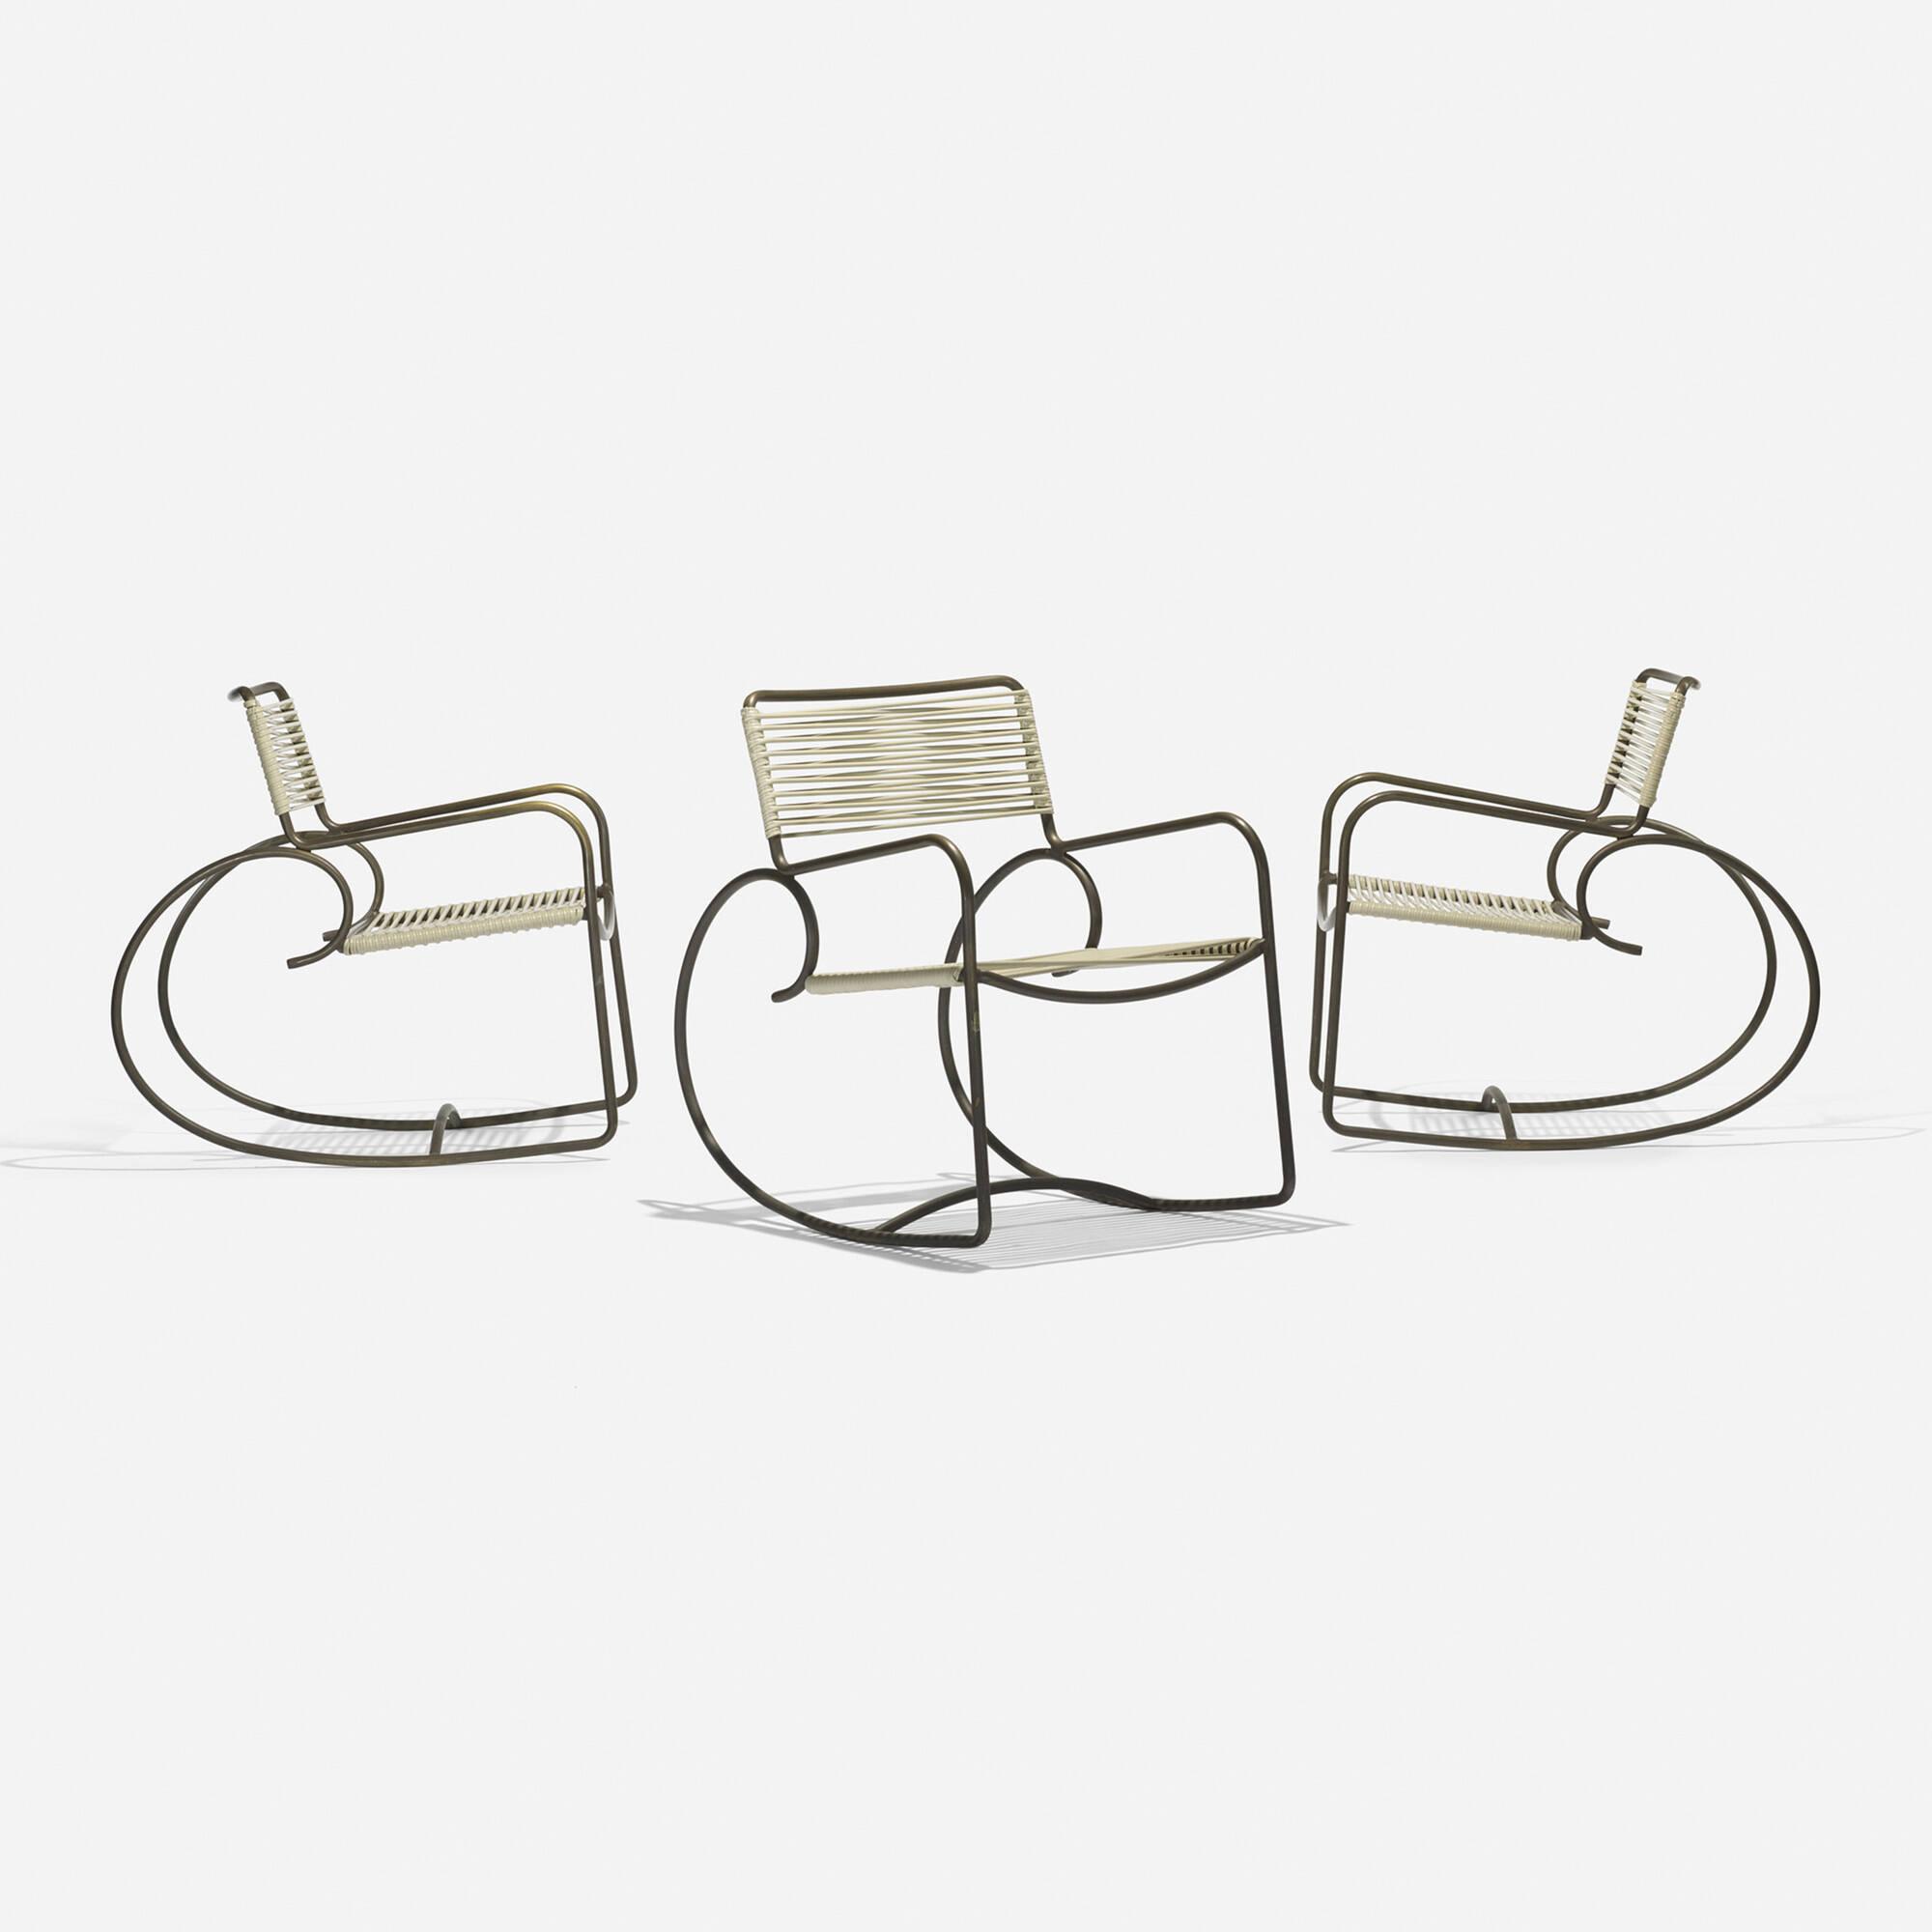 Sensational 332 Walter Lamb Rocking Chairs Model C 5701 Set Of Three Inzonedesignstudio Interior Chair Design Inzonedesignstudiocom